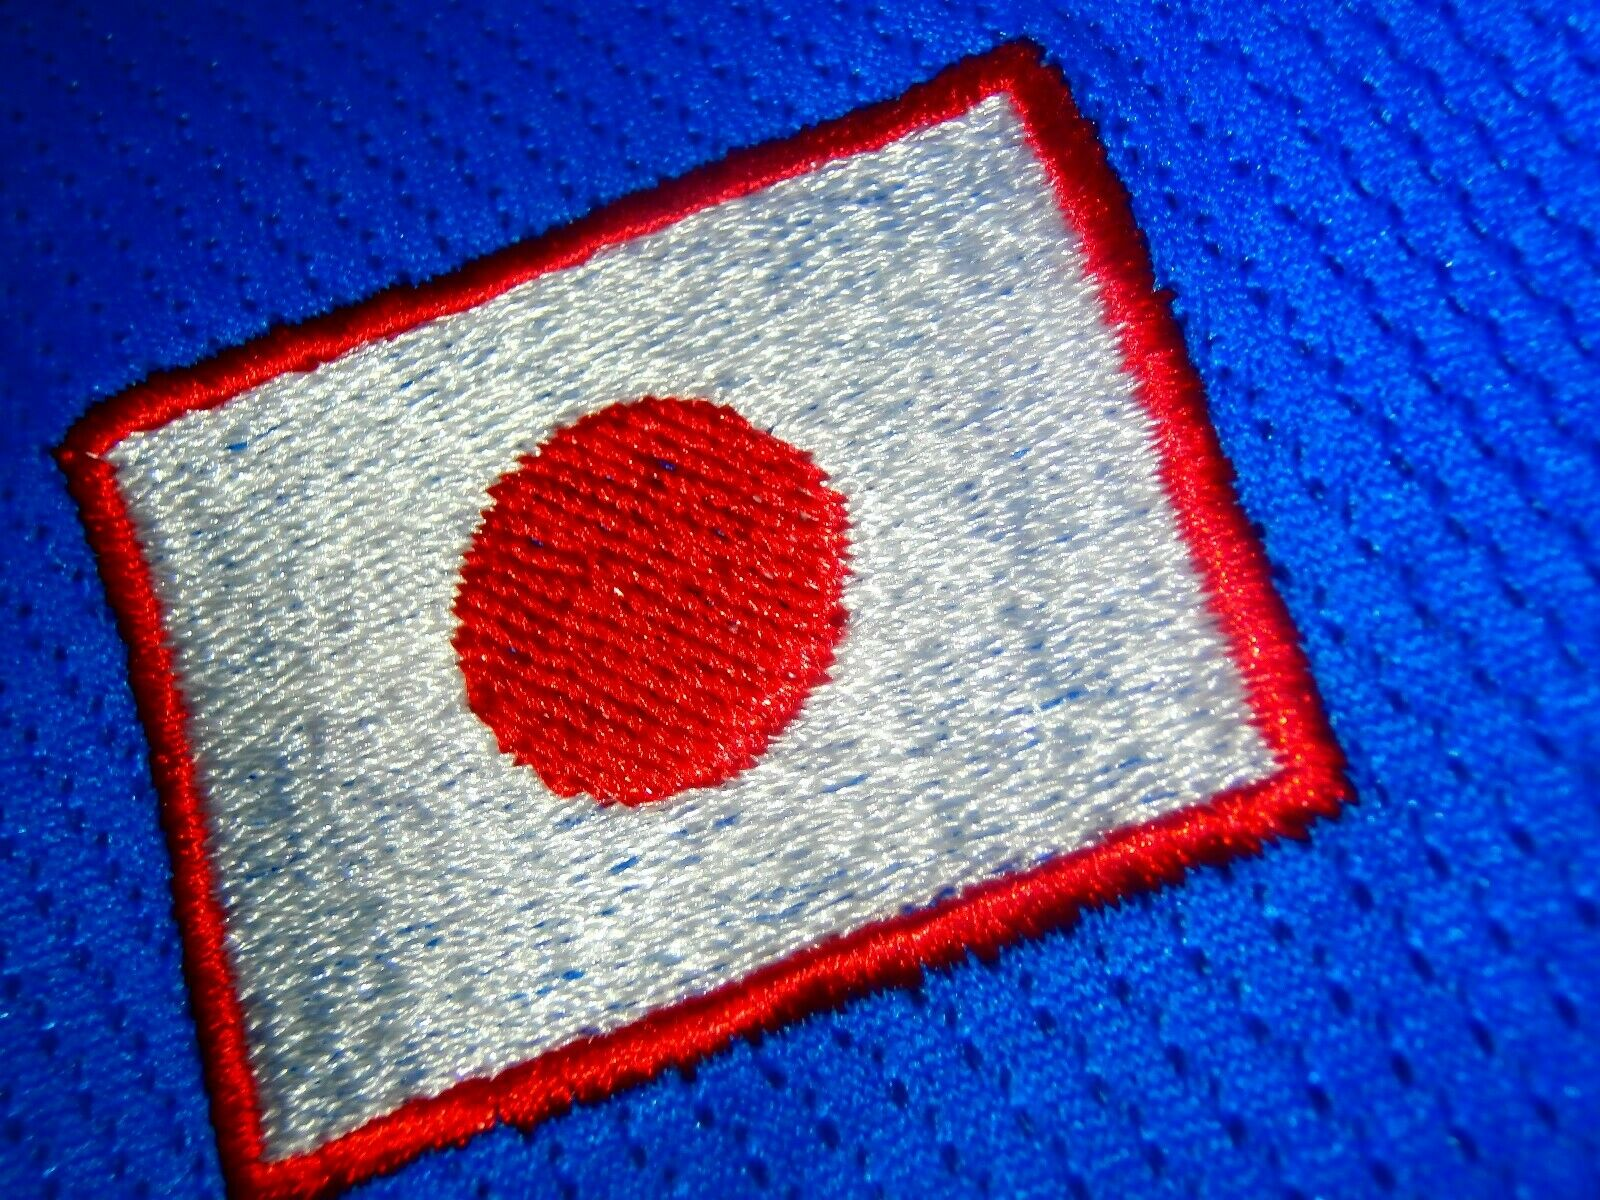 JAPAN NATIONAL TEAM SHIRT JERSEY KIT MEN L 2010 SOUTH AFRICA FIFA WORLD CUP   3